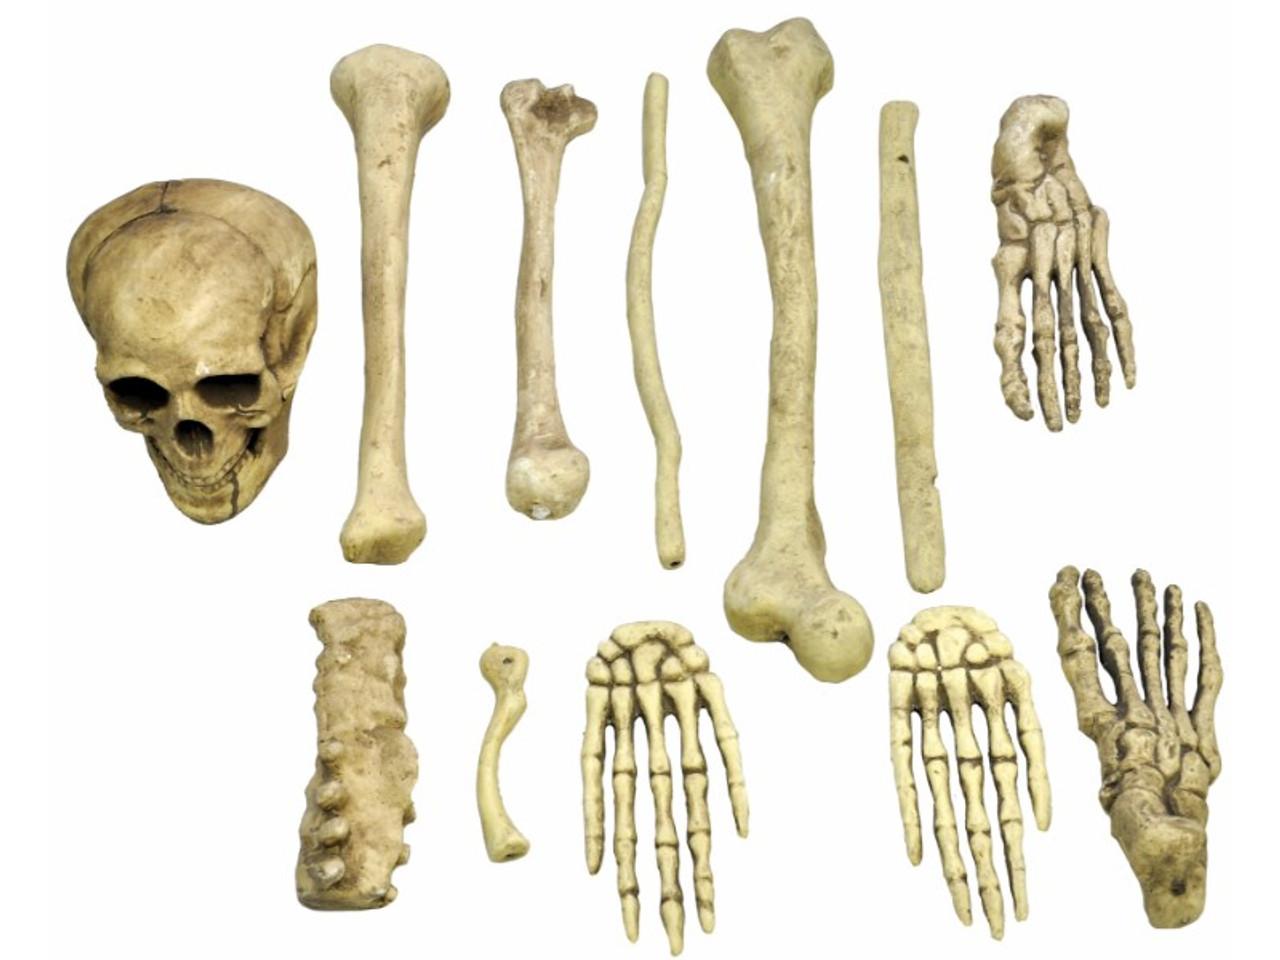 Buy Skeleton Bones In Bag That Has An Assortment Of 12